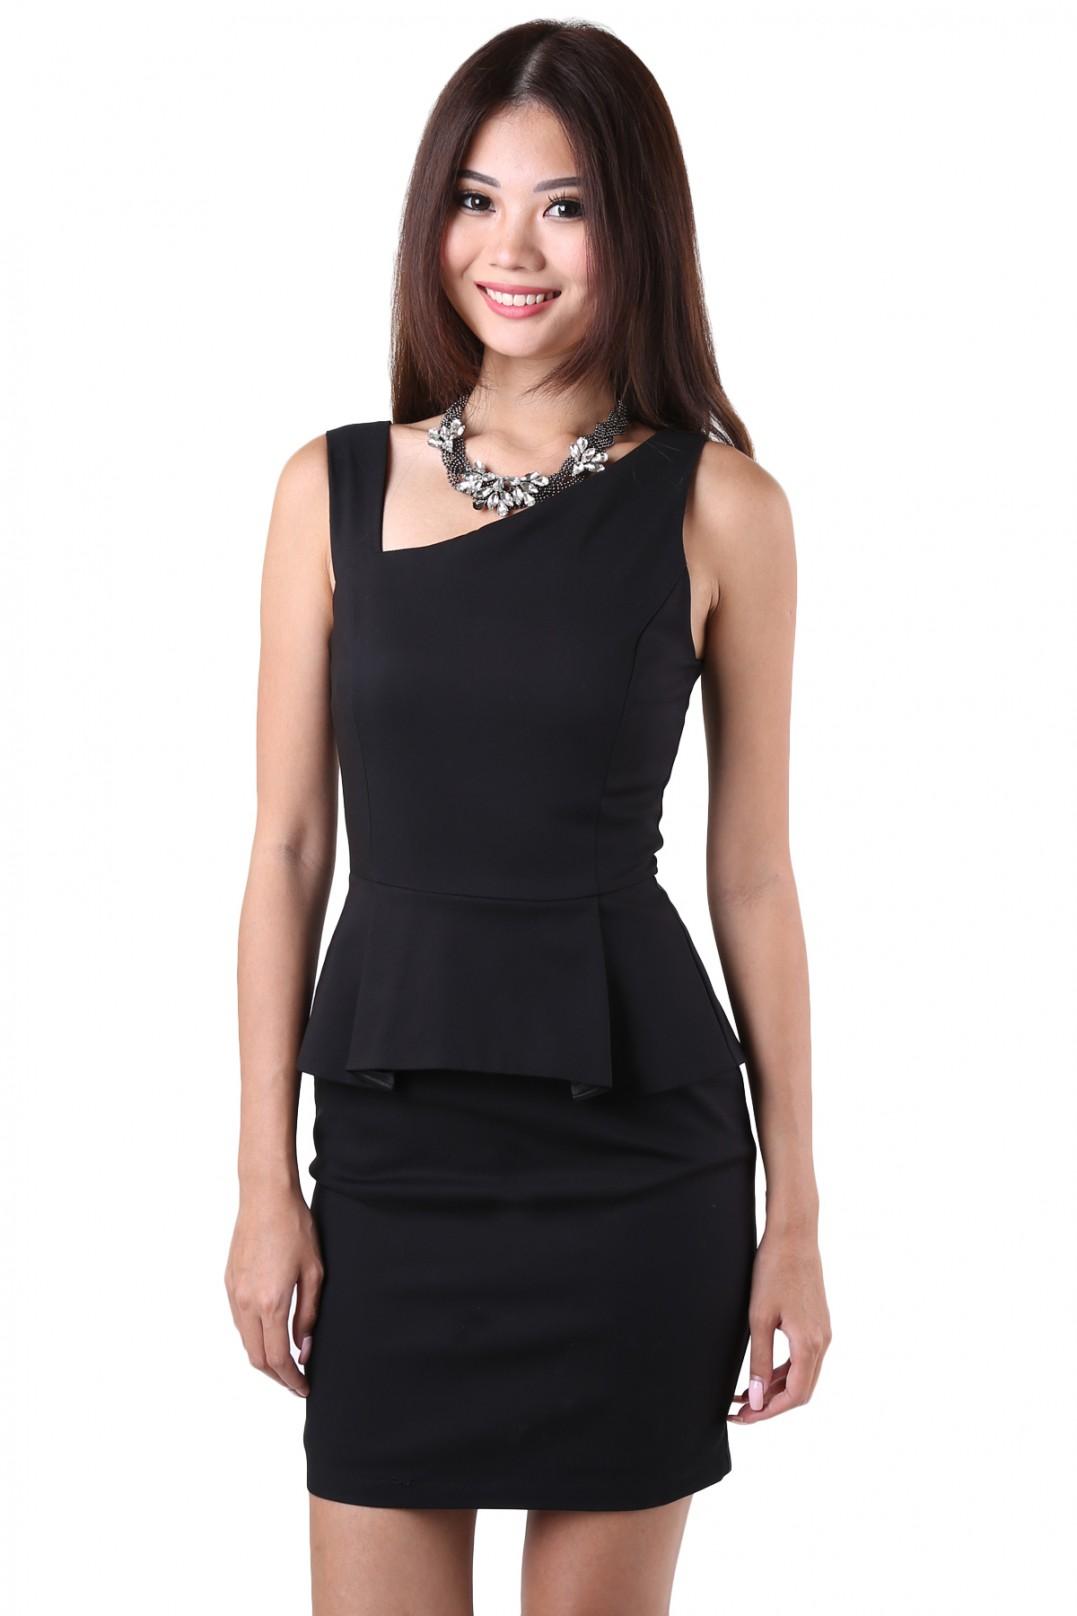 Free shipping and returns on Women's Peplum Dresses at liveblog.ga